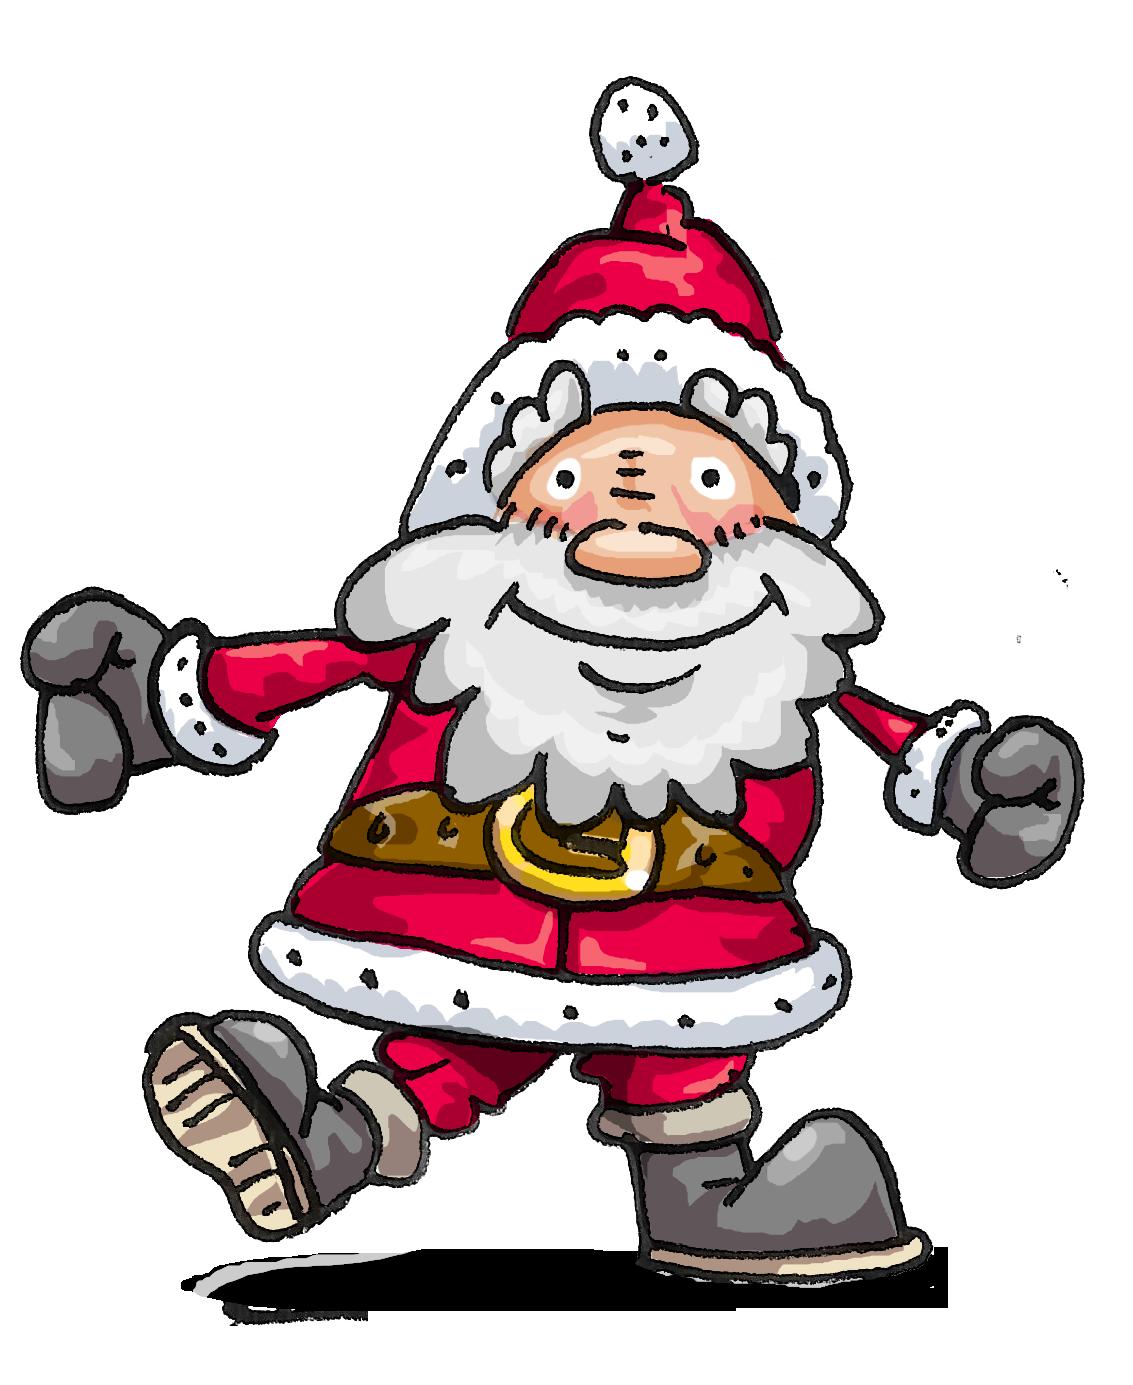 Happy Christmas Jokes - Tom E. Moffatt